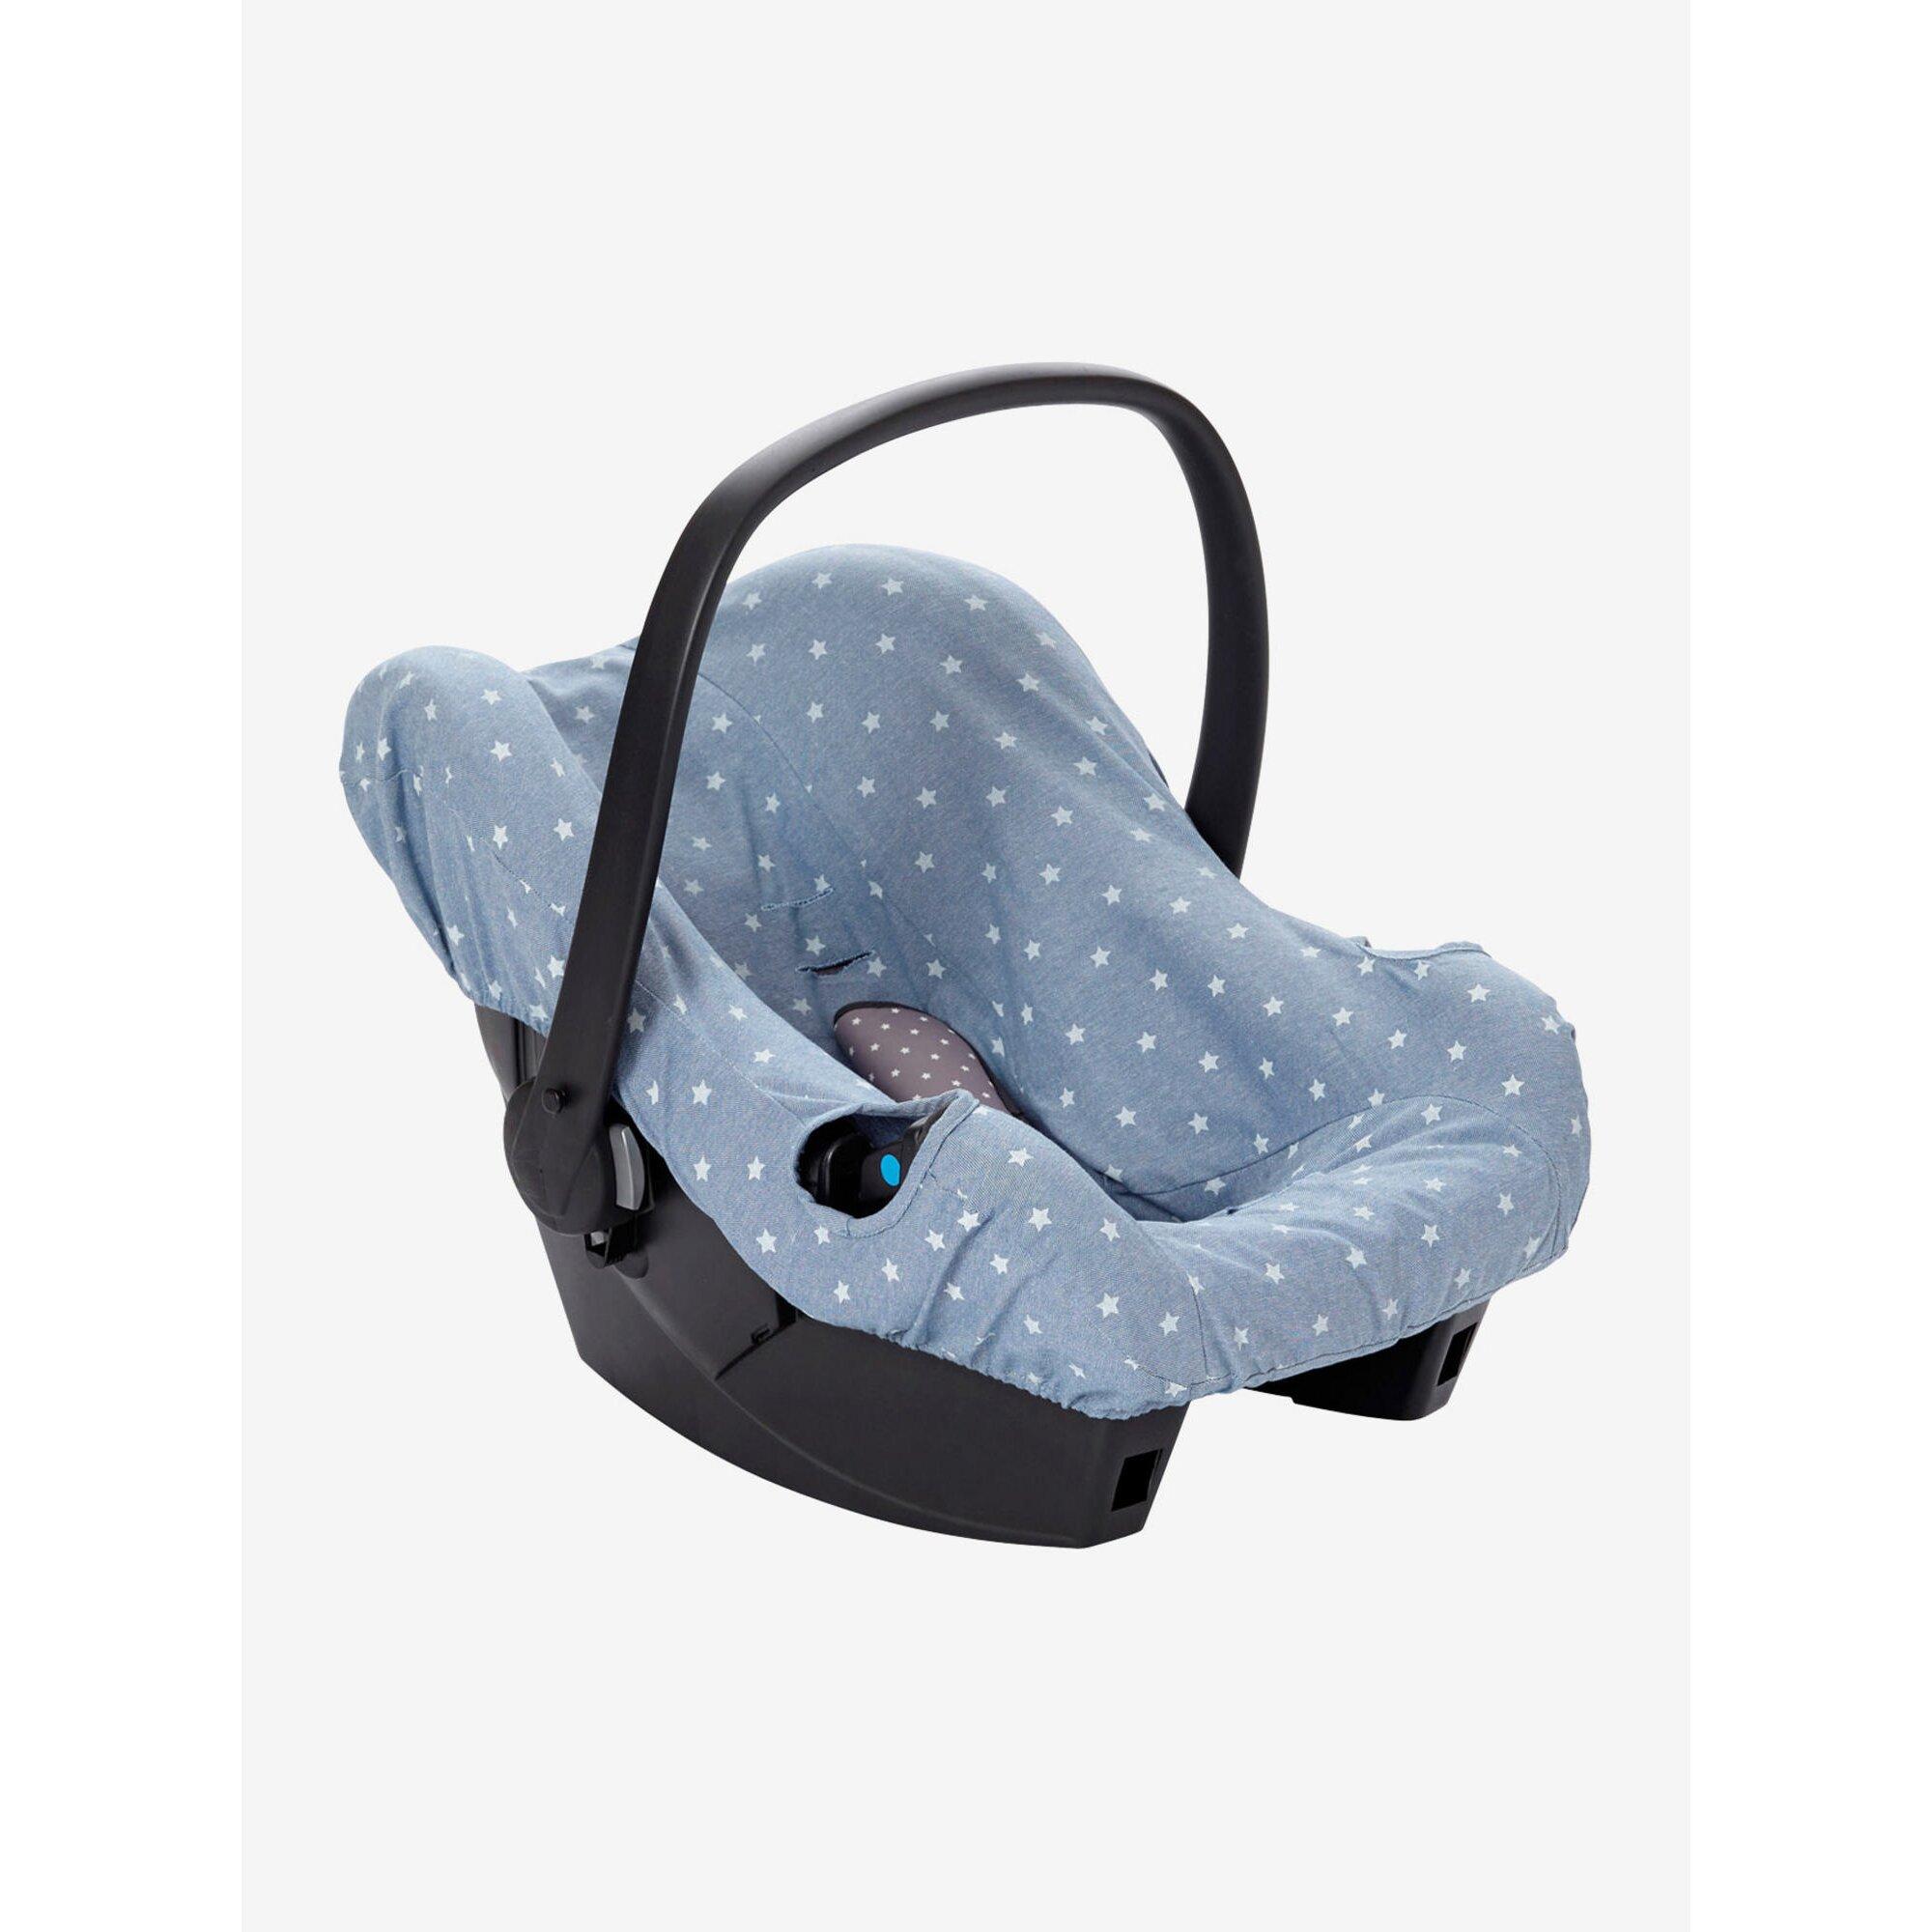 vertbaudet-schonbezug-fur-babyschale-gr-0-elastisch, 16.99 EUR @ babywalz-de